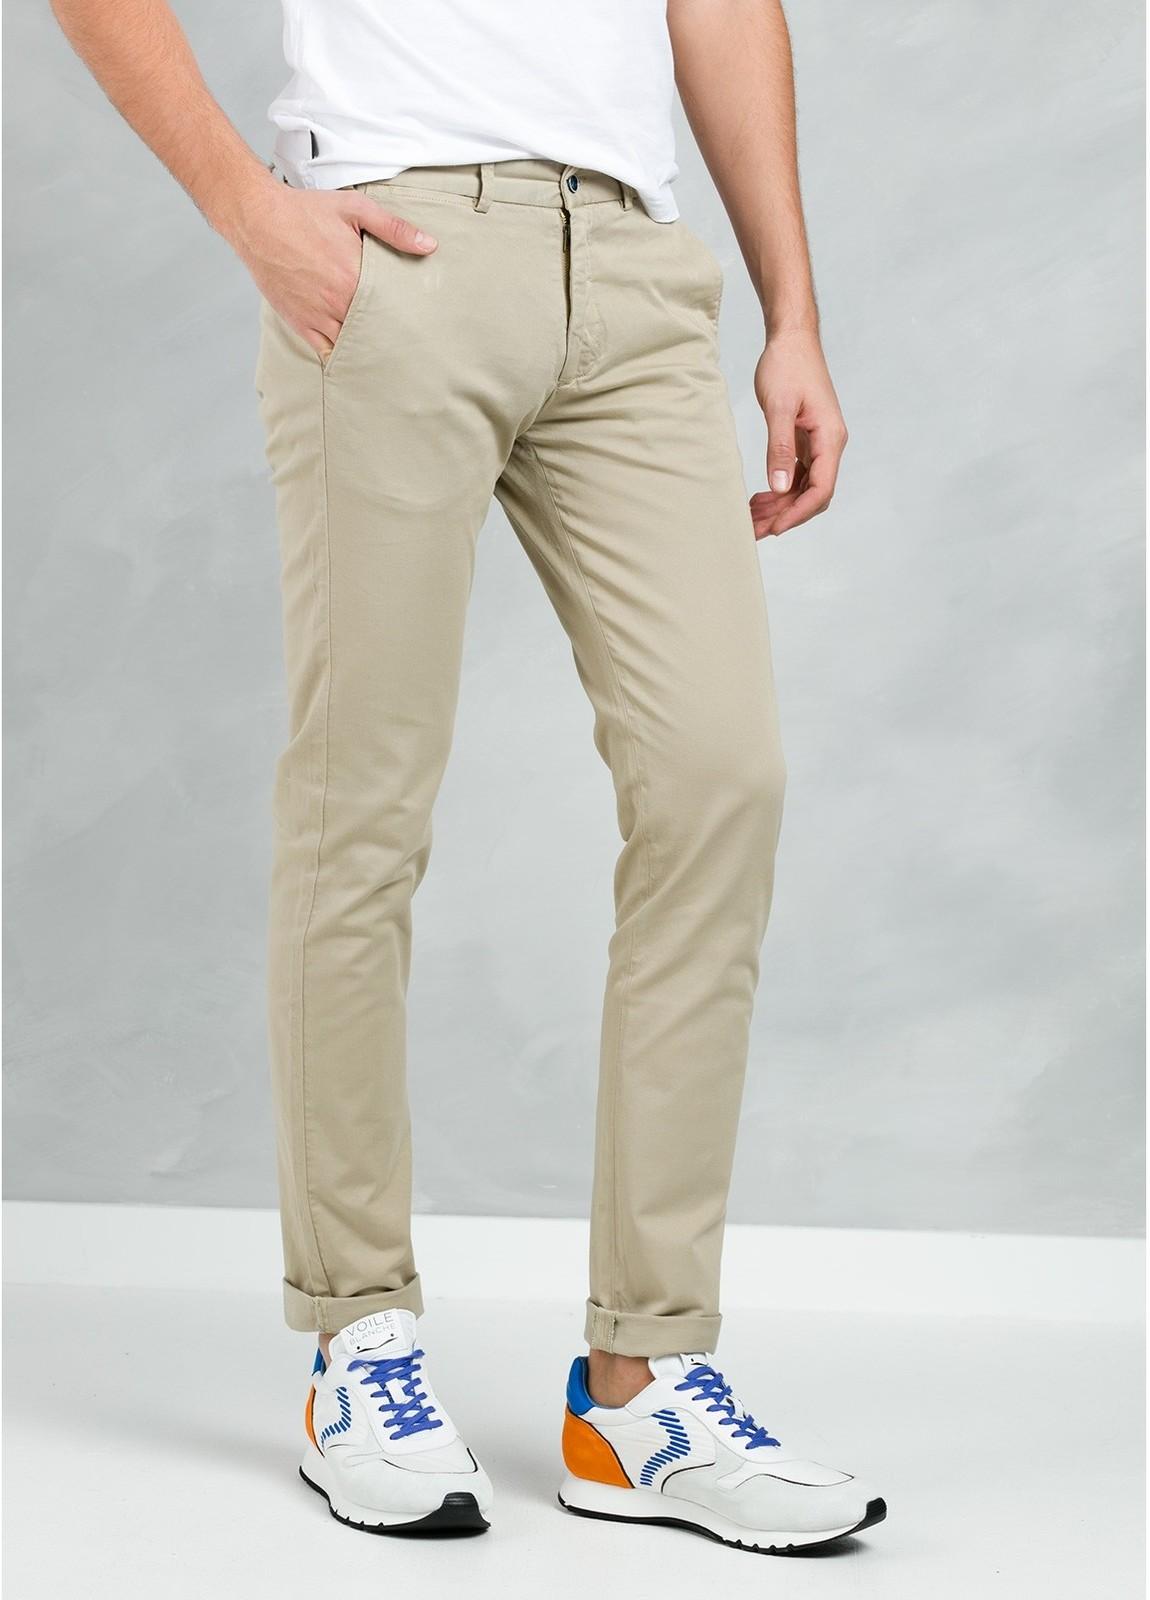 Pantalón Casual Wear, SLIM FIT micro textura color beige, 97% Algodón 3% Elastómero. - Ítem2